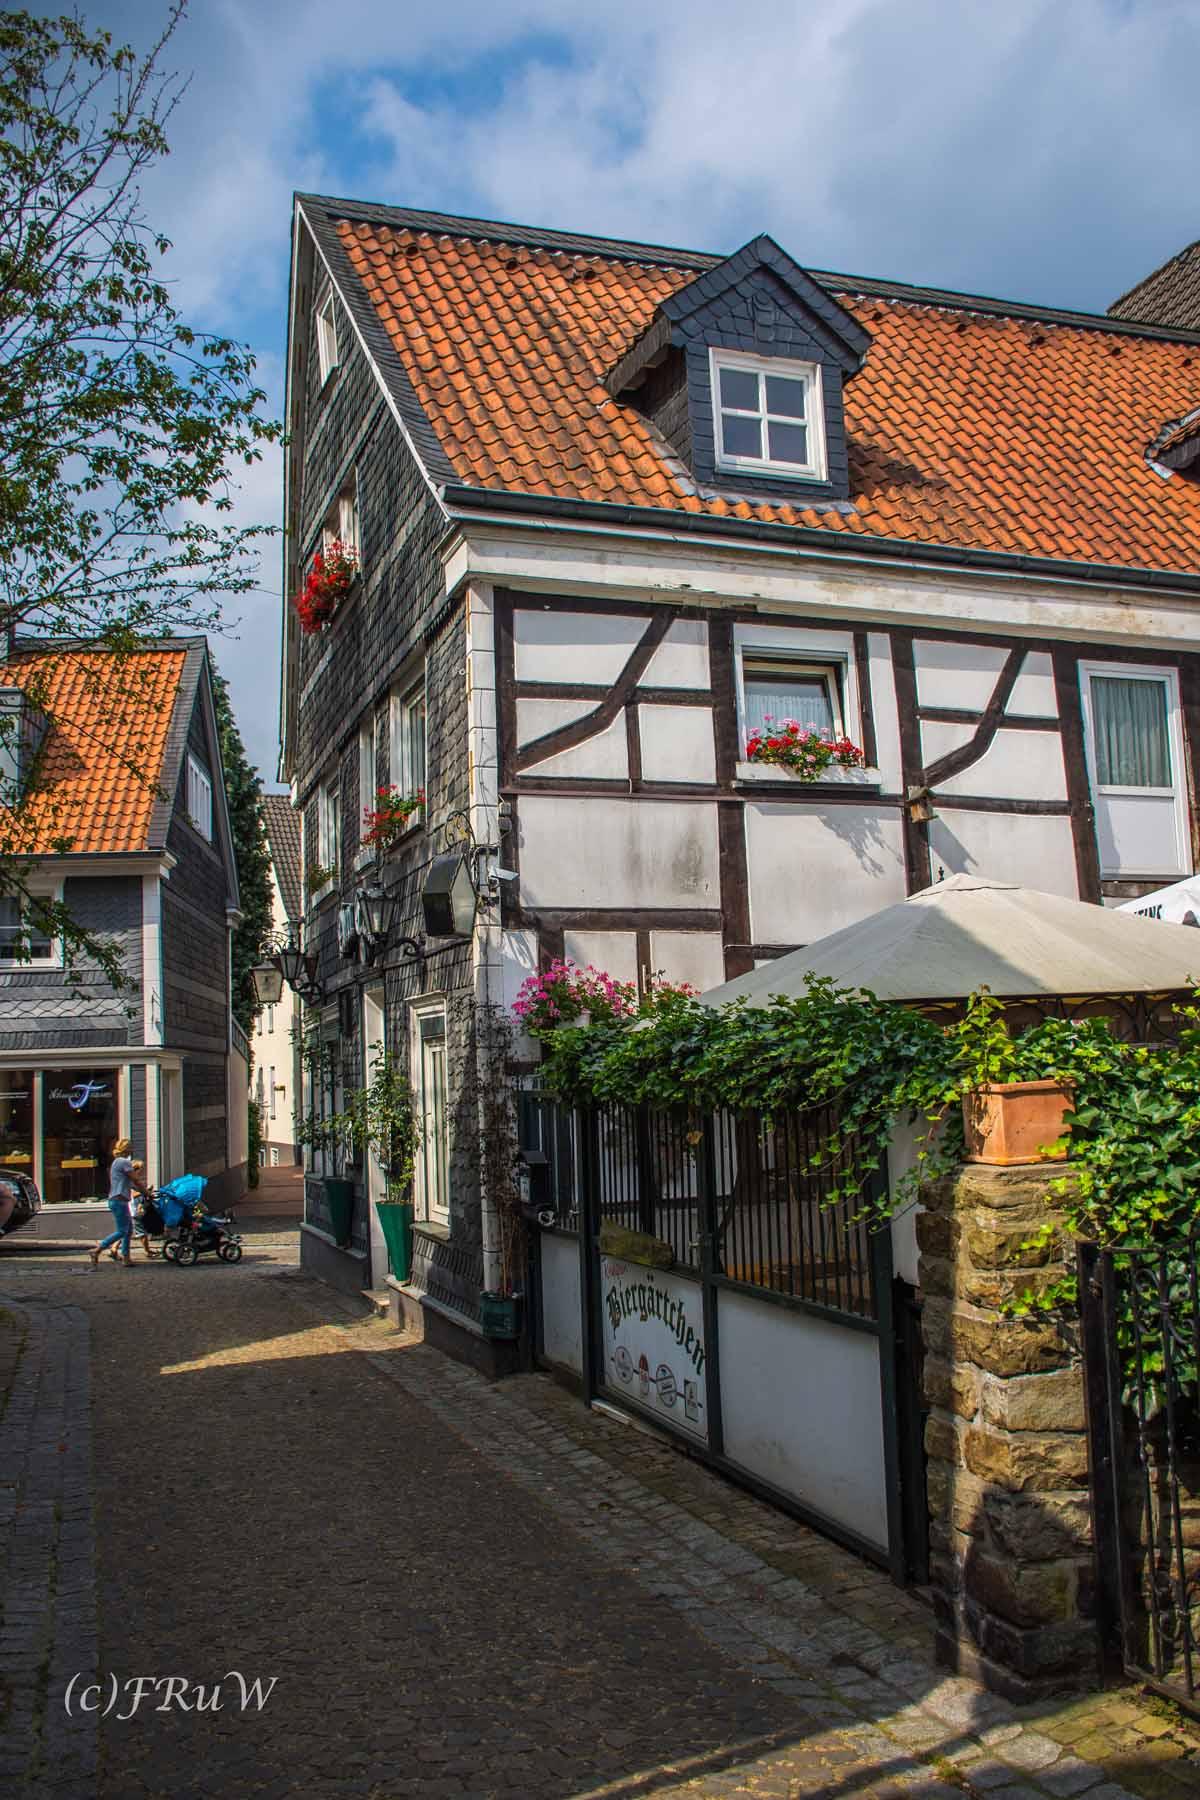 Kettwig_A1_Ruhrpromenade_0191